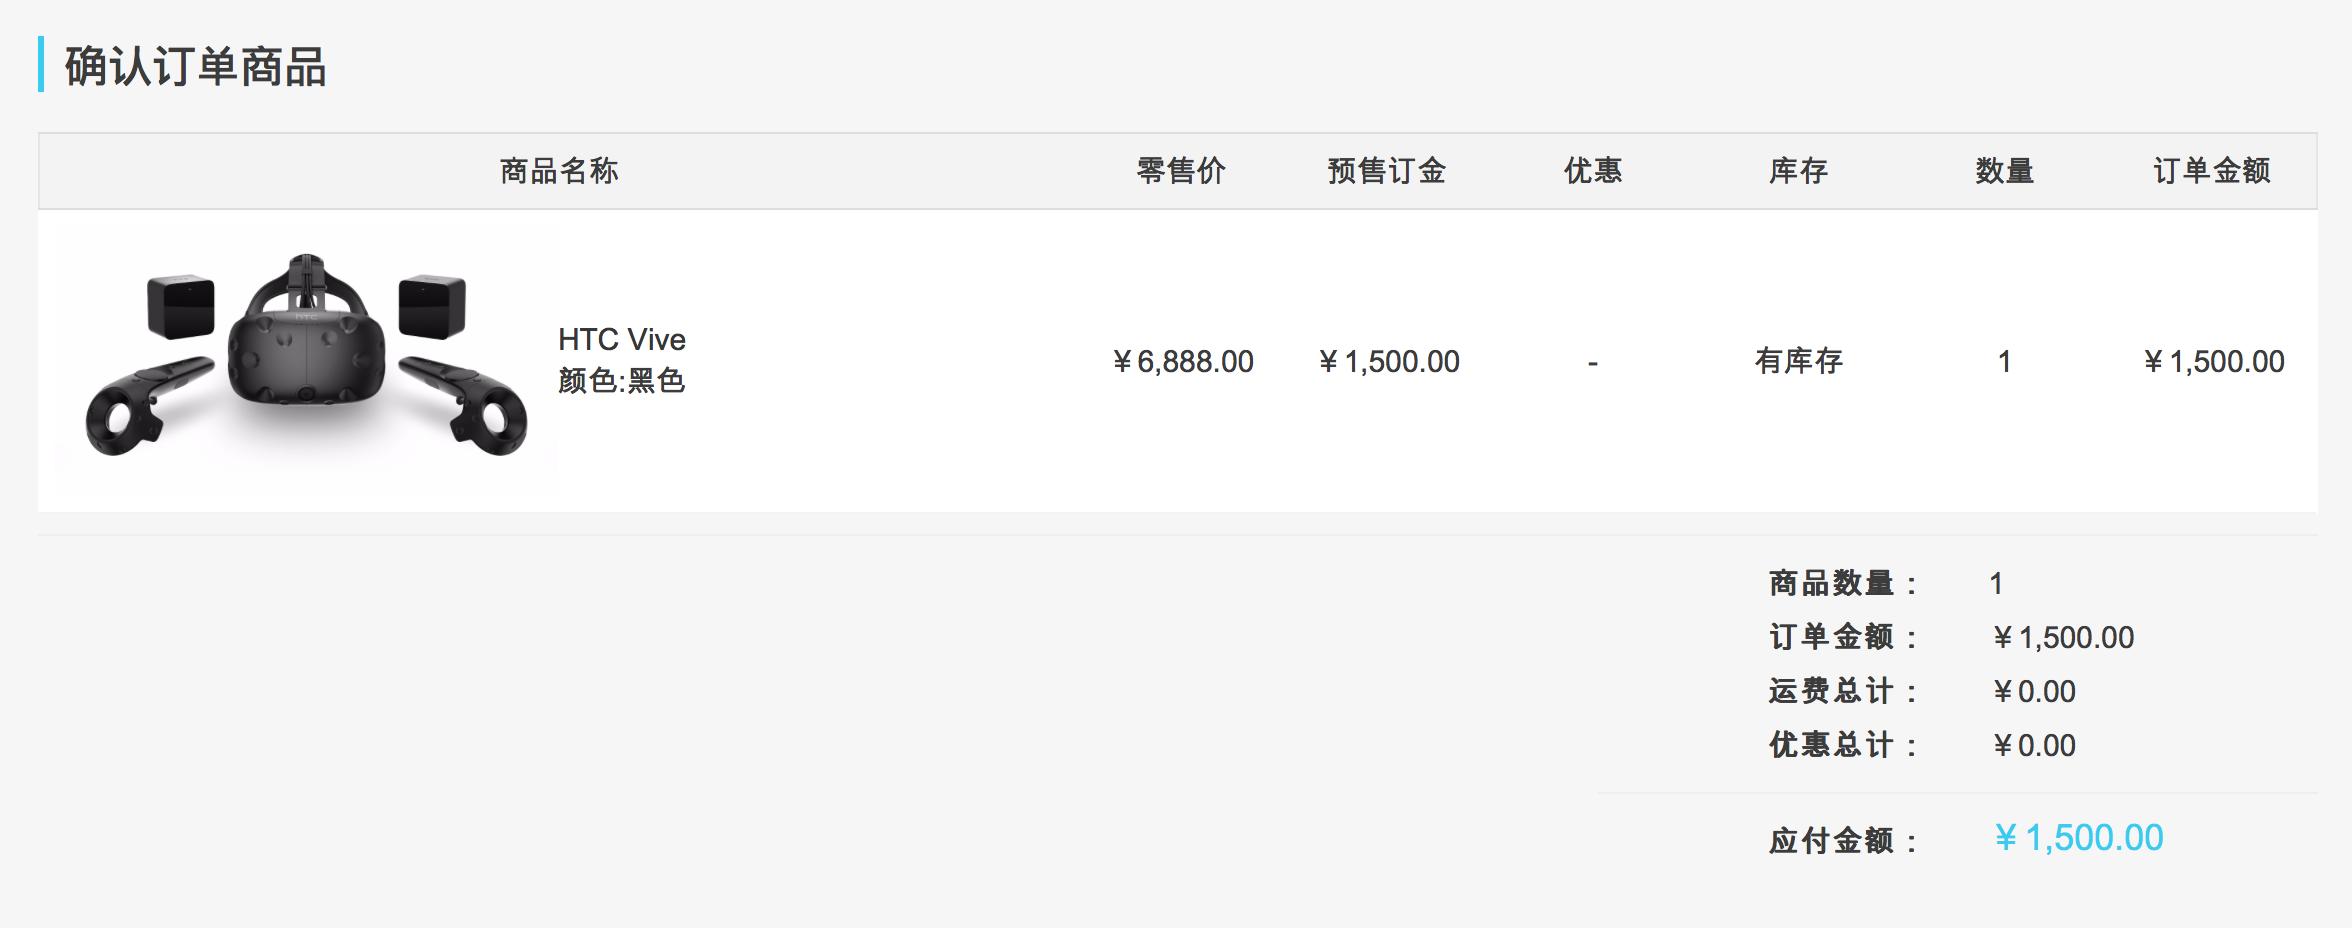 HTC Vive 的预订定金是人民币 1500 元。